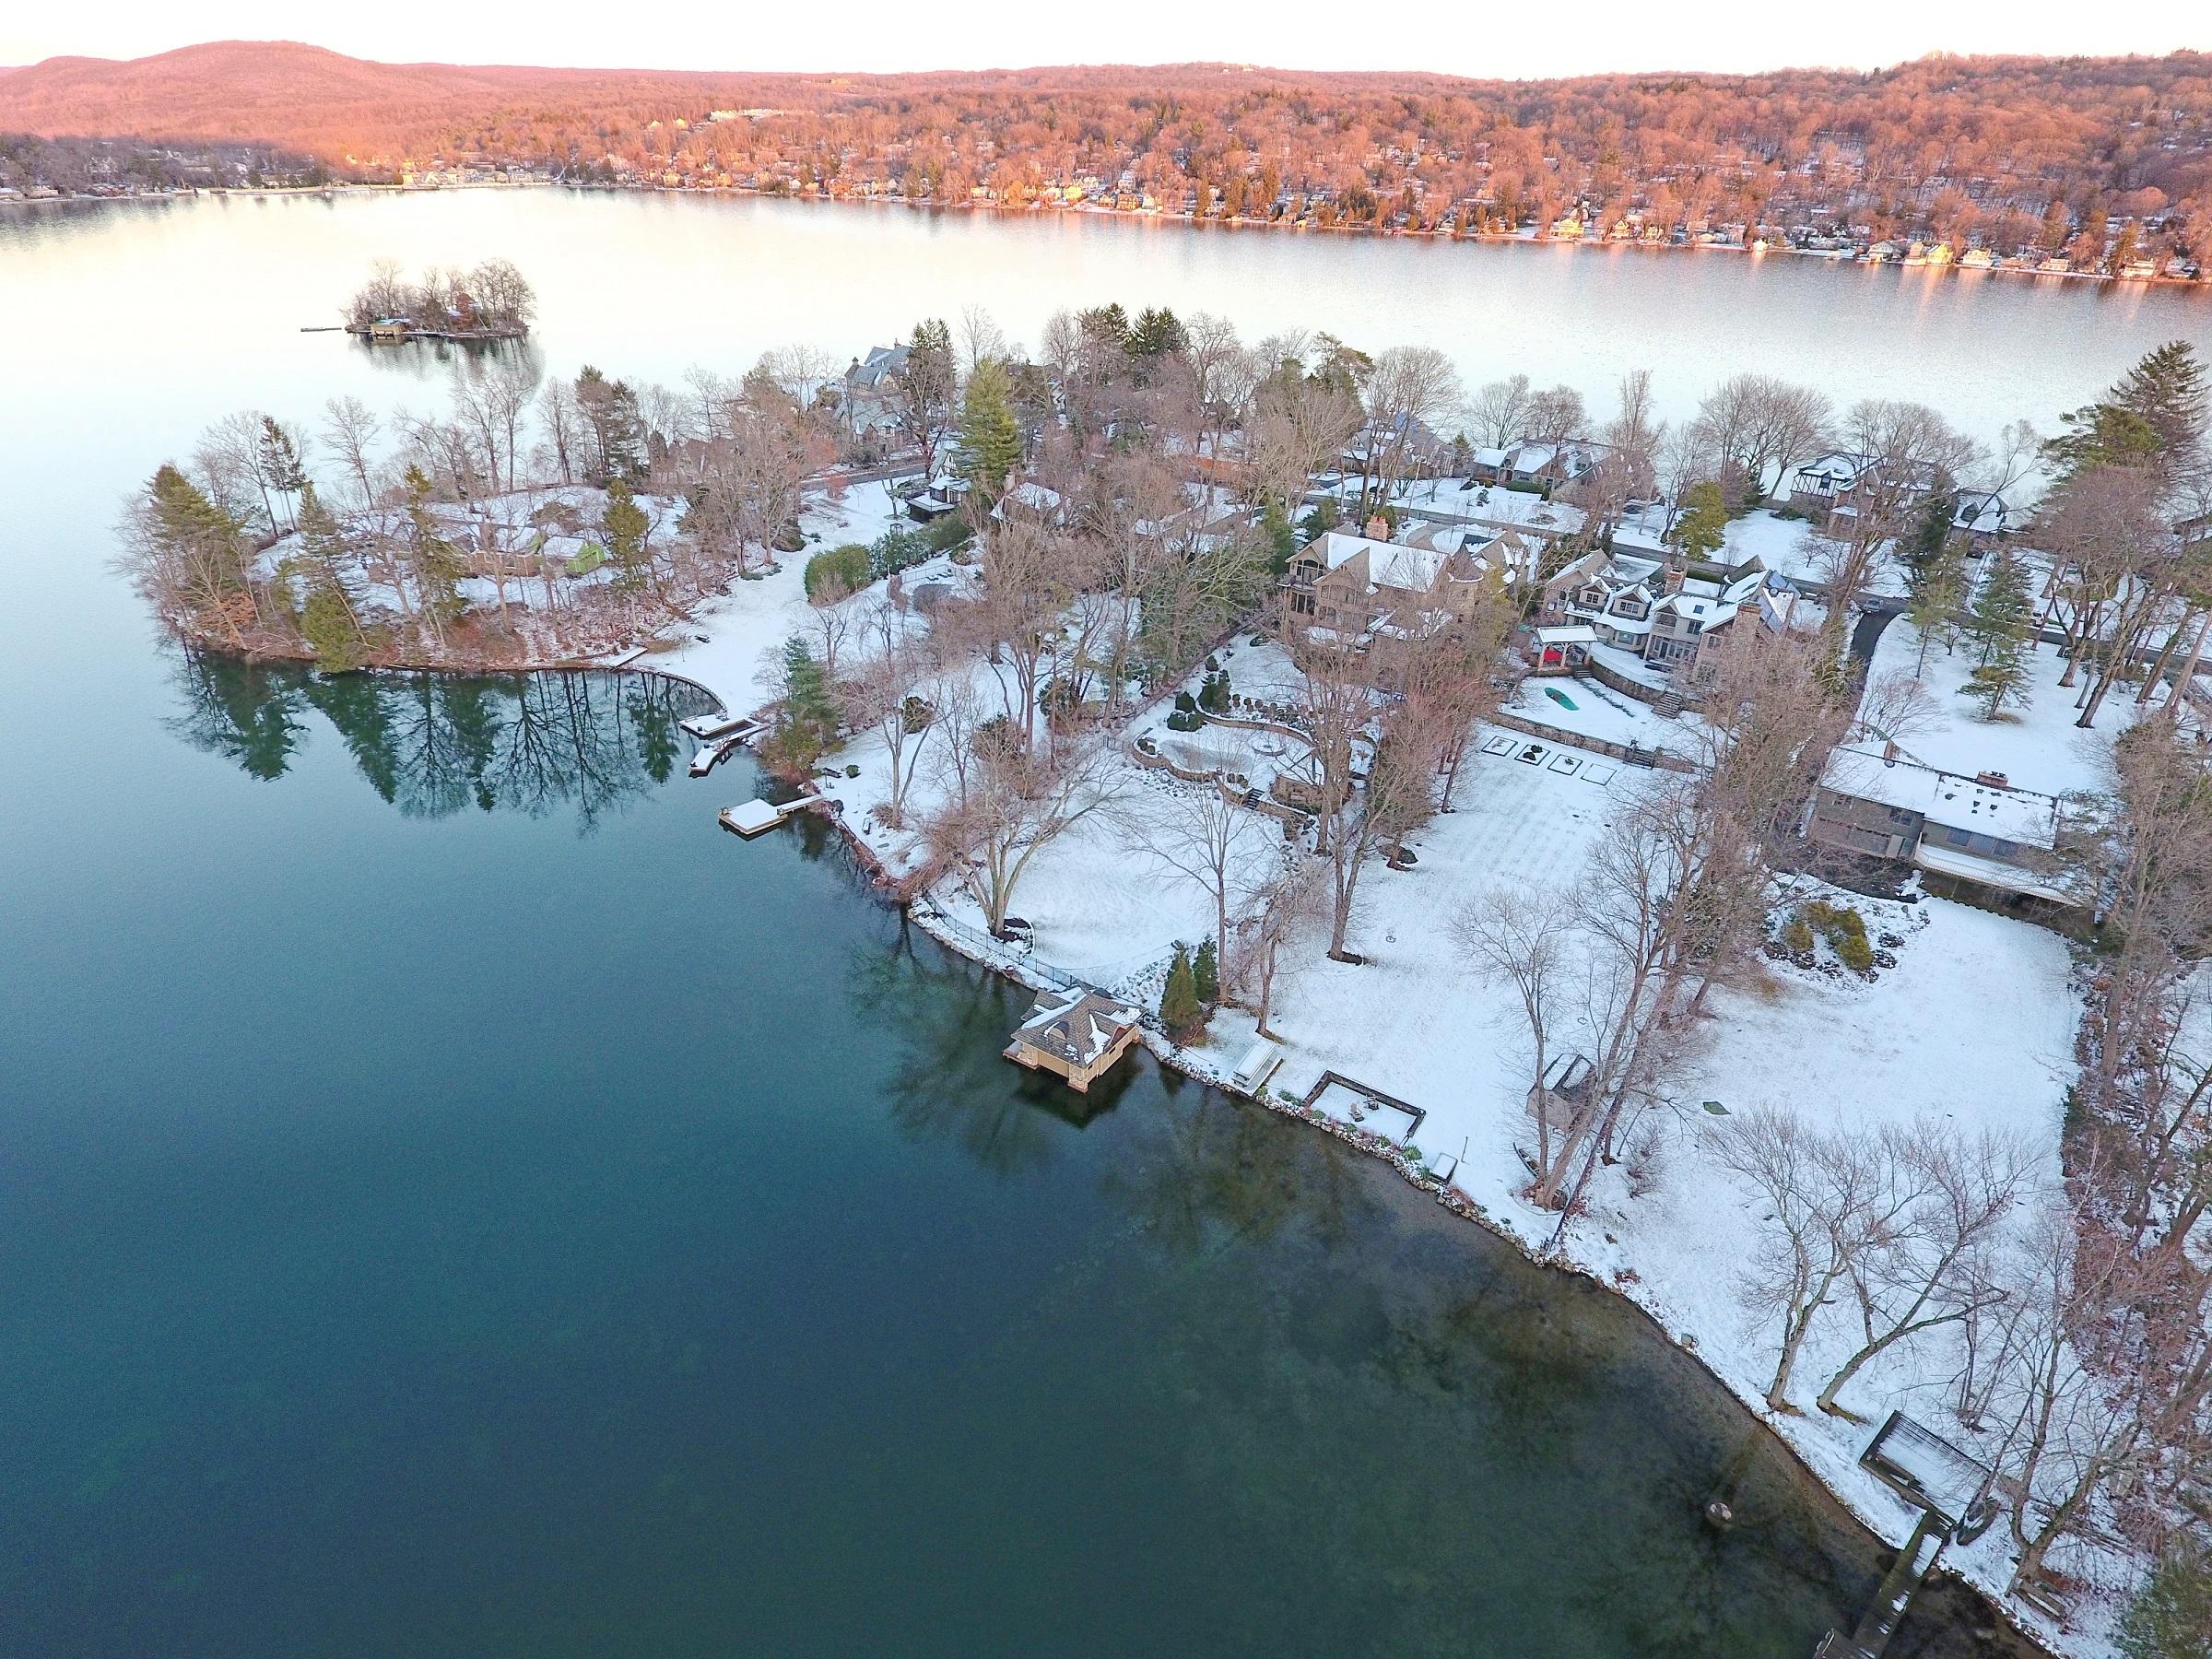 manitou island - lake mohawk, sparta, NJ